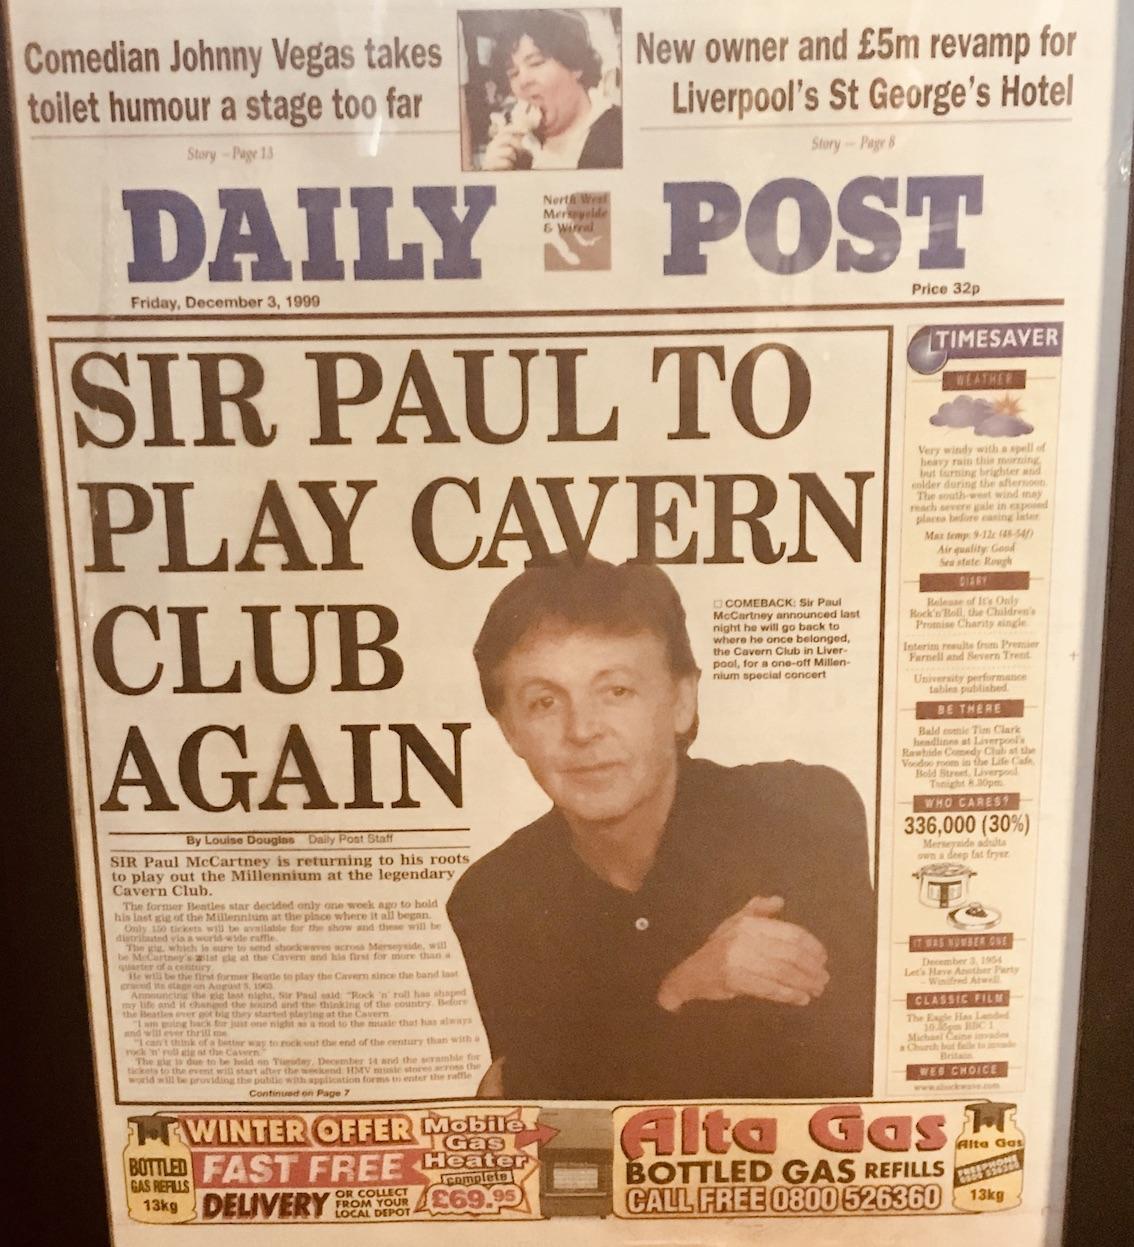 Daily Post Sir Paul McCartney to play Cavern Club Again